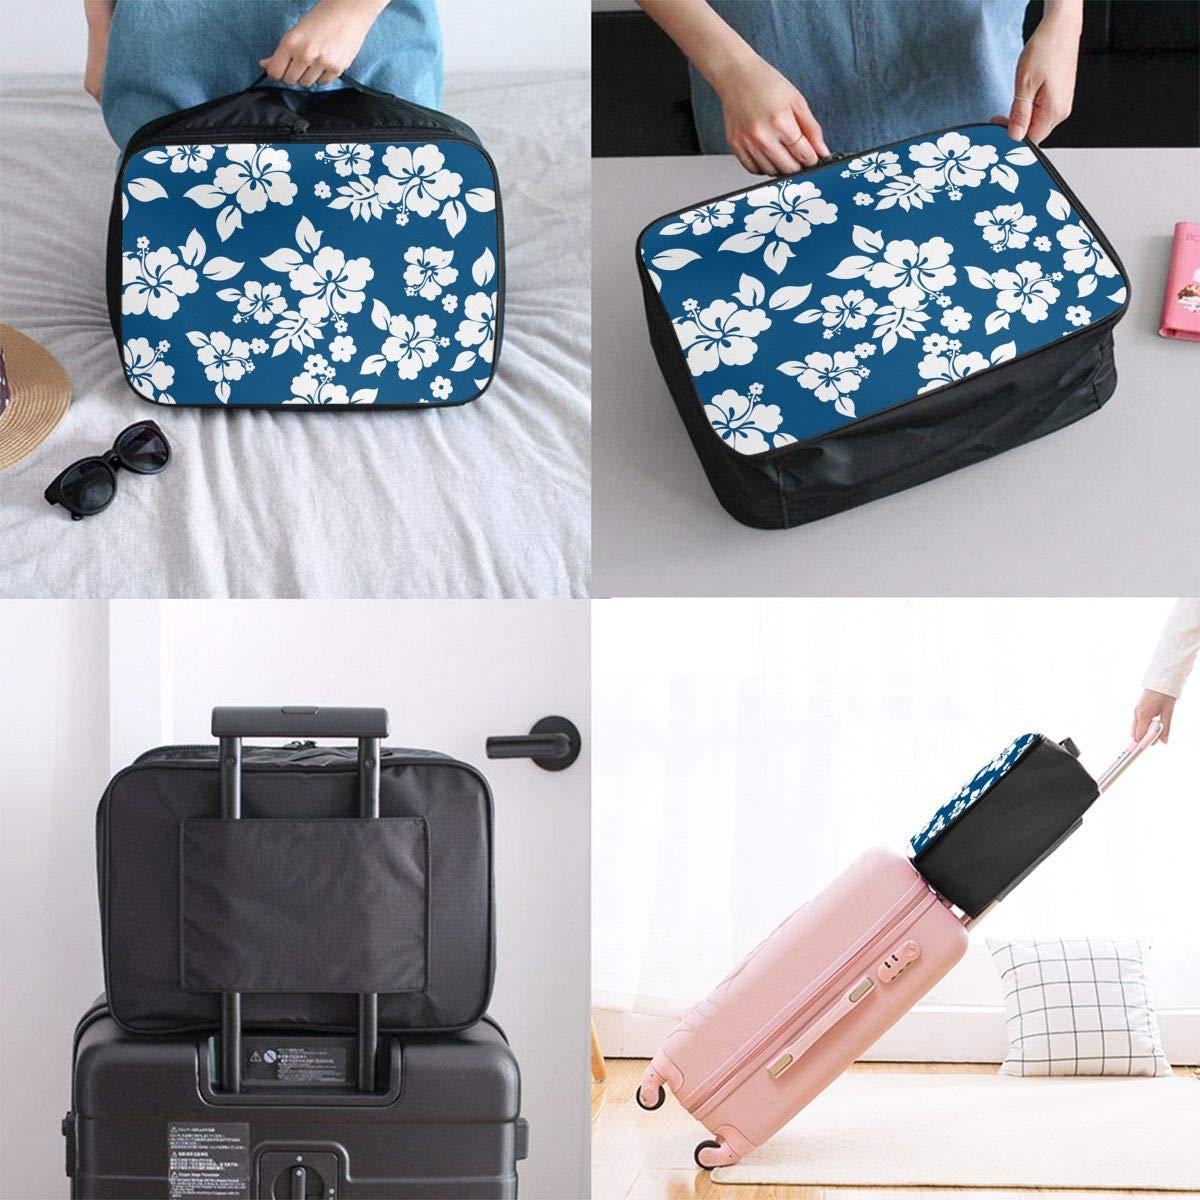 Women /& Men Foldable Travel Duffel Bag Aloha Hawaiian Floral For Luggage Gym Sports